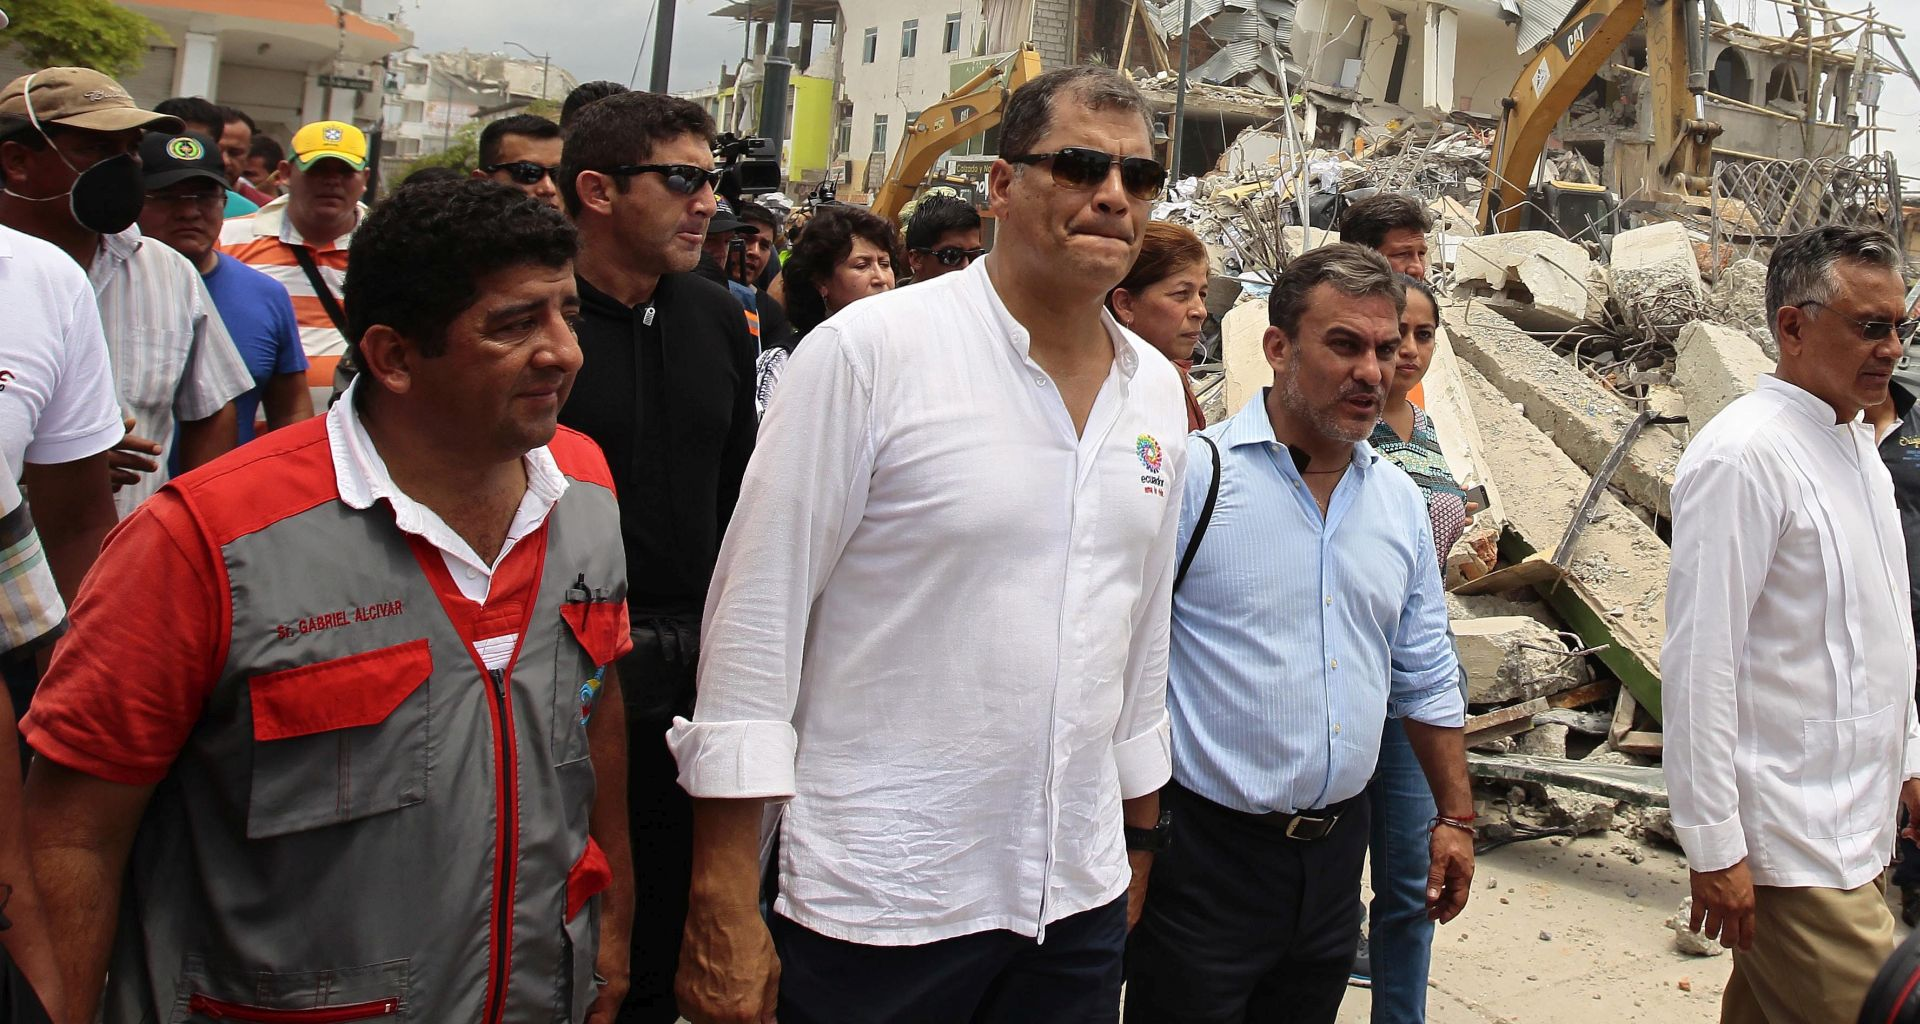 EKVADOR: Predsjednik uvodi porez najbogatijima za obnovu zemlje nakon potresa